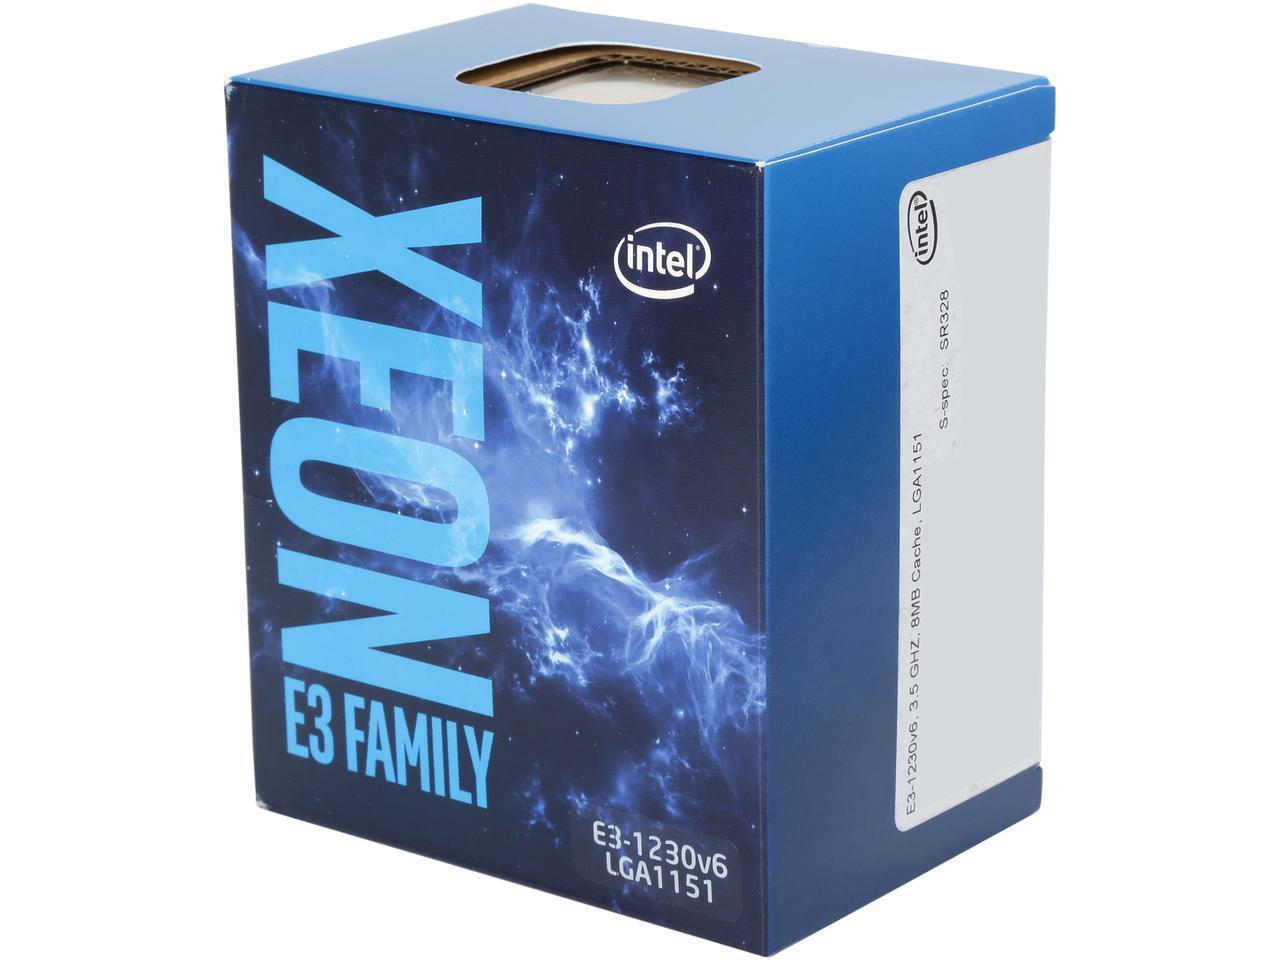 CPU-1151-Xeon-E3-1230_v6-Intel